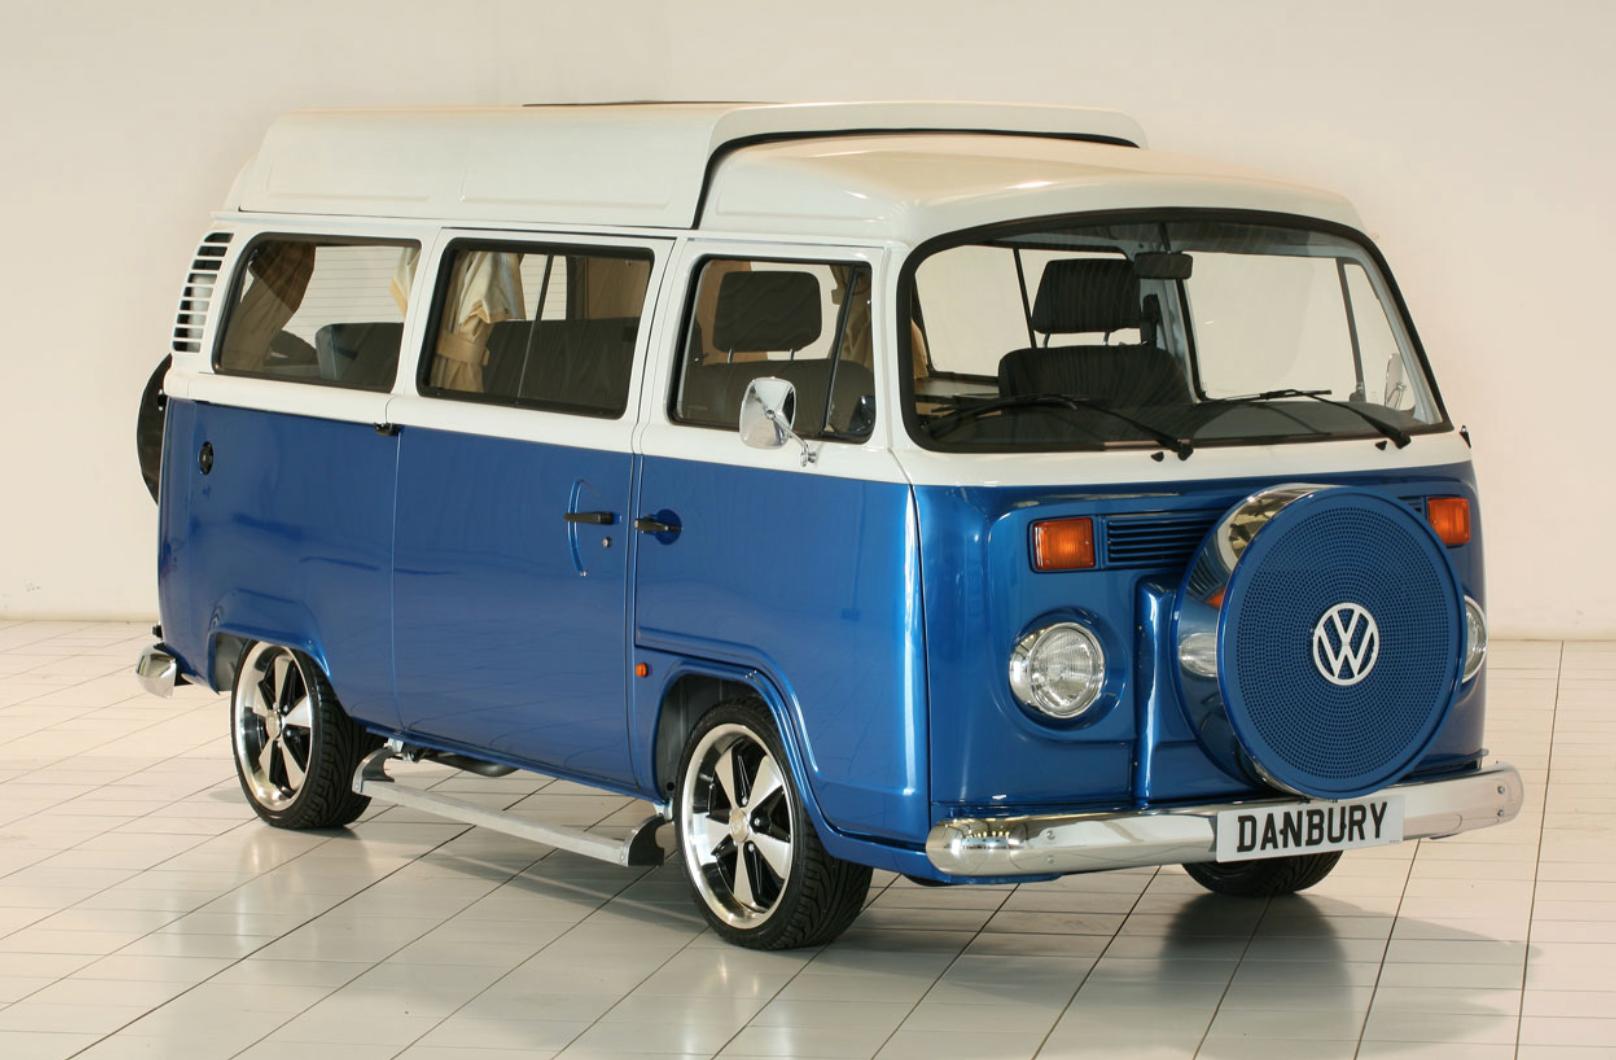 small campers - Volkswagen Bus Camper